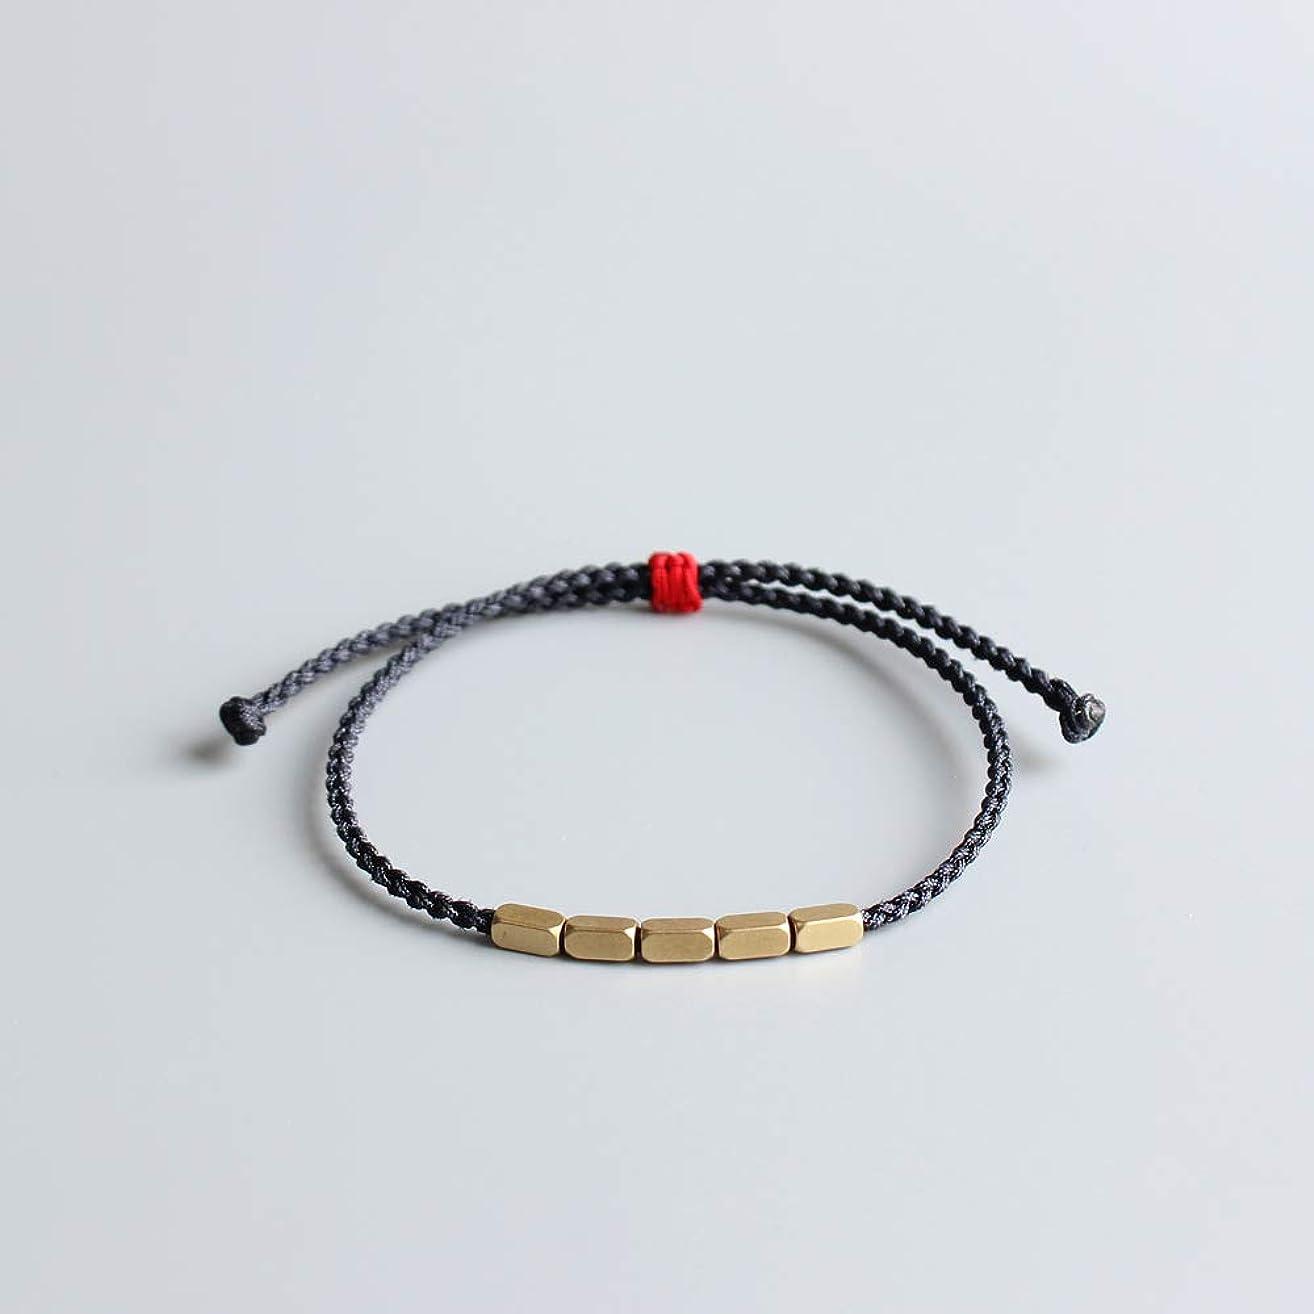 TALE Lucky Rope Bracelet Tibetan Buddhist Hand Braided Knots Couple bangle- Thin Edition- Deep Grey